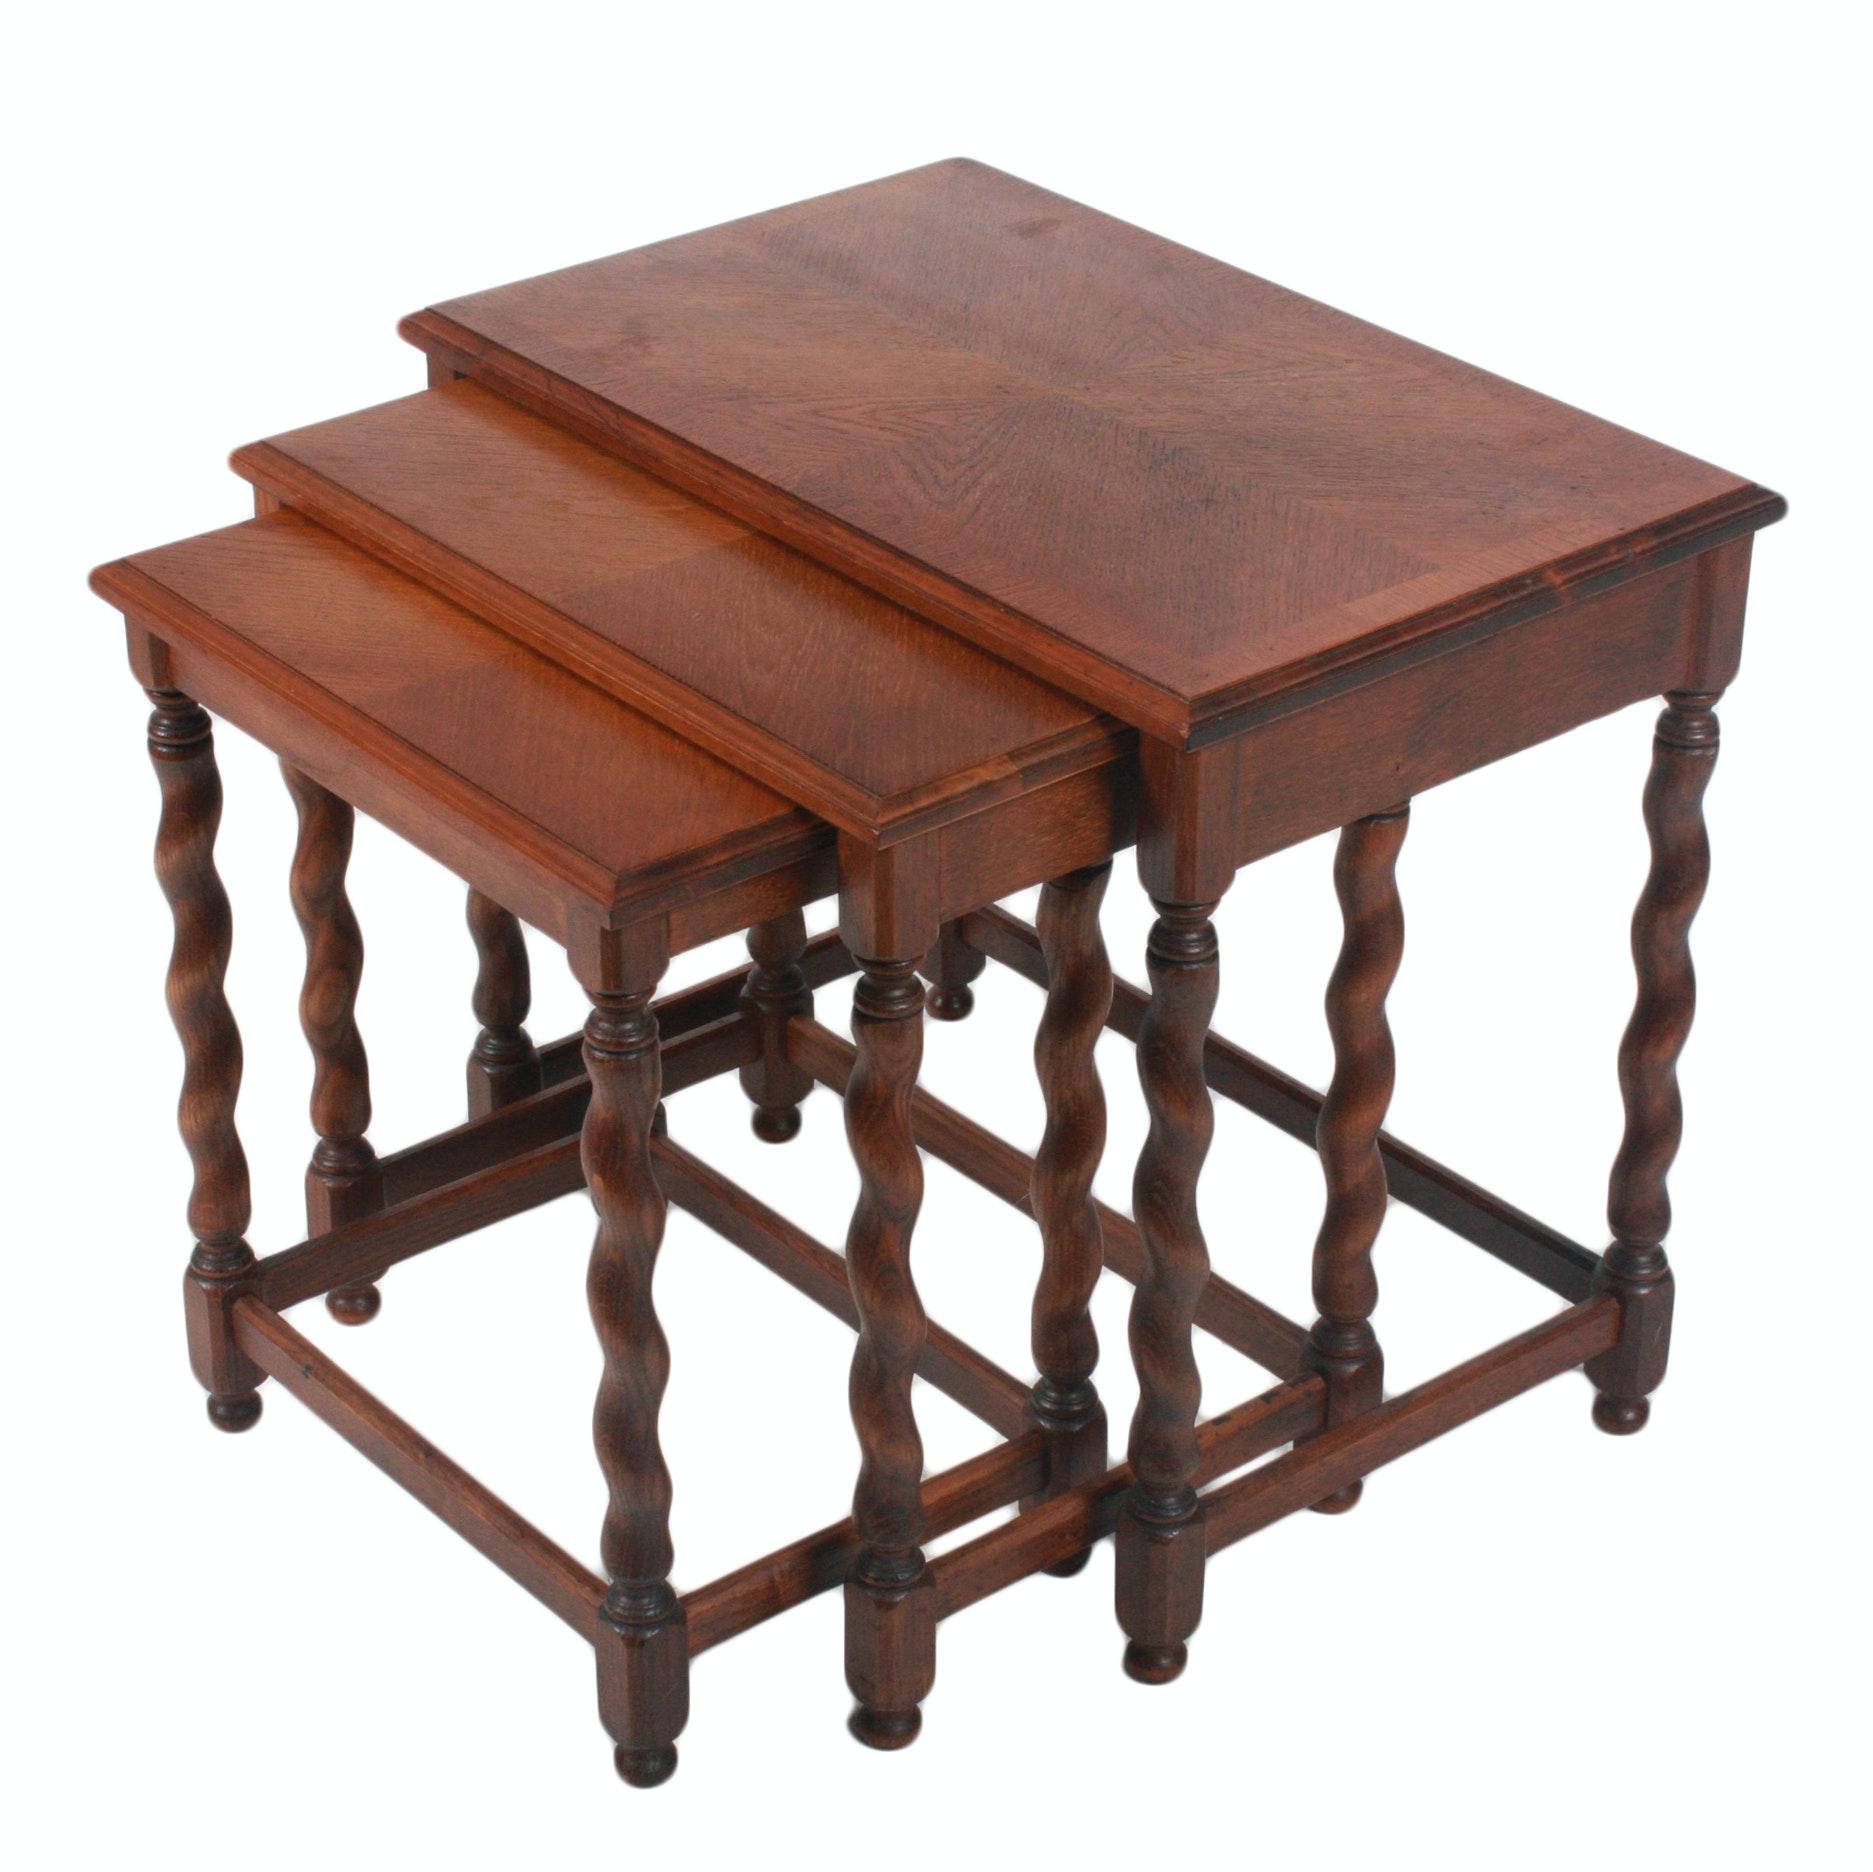 Set of Walnut Nesting Tables with Barley Twist Legs